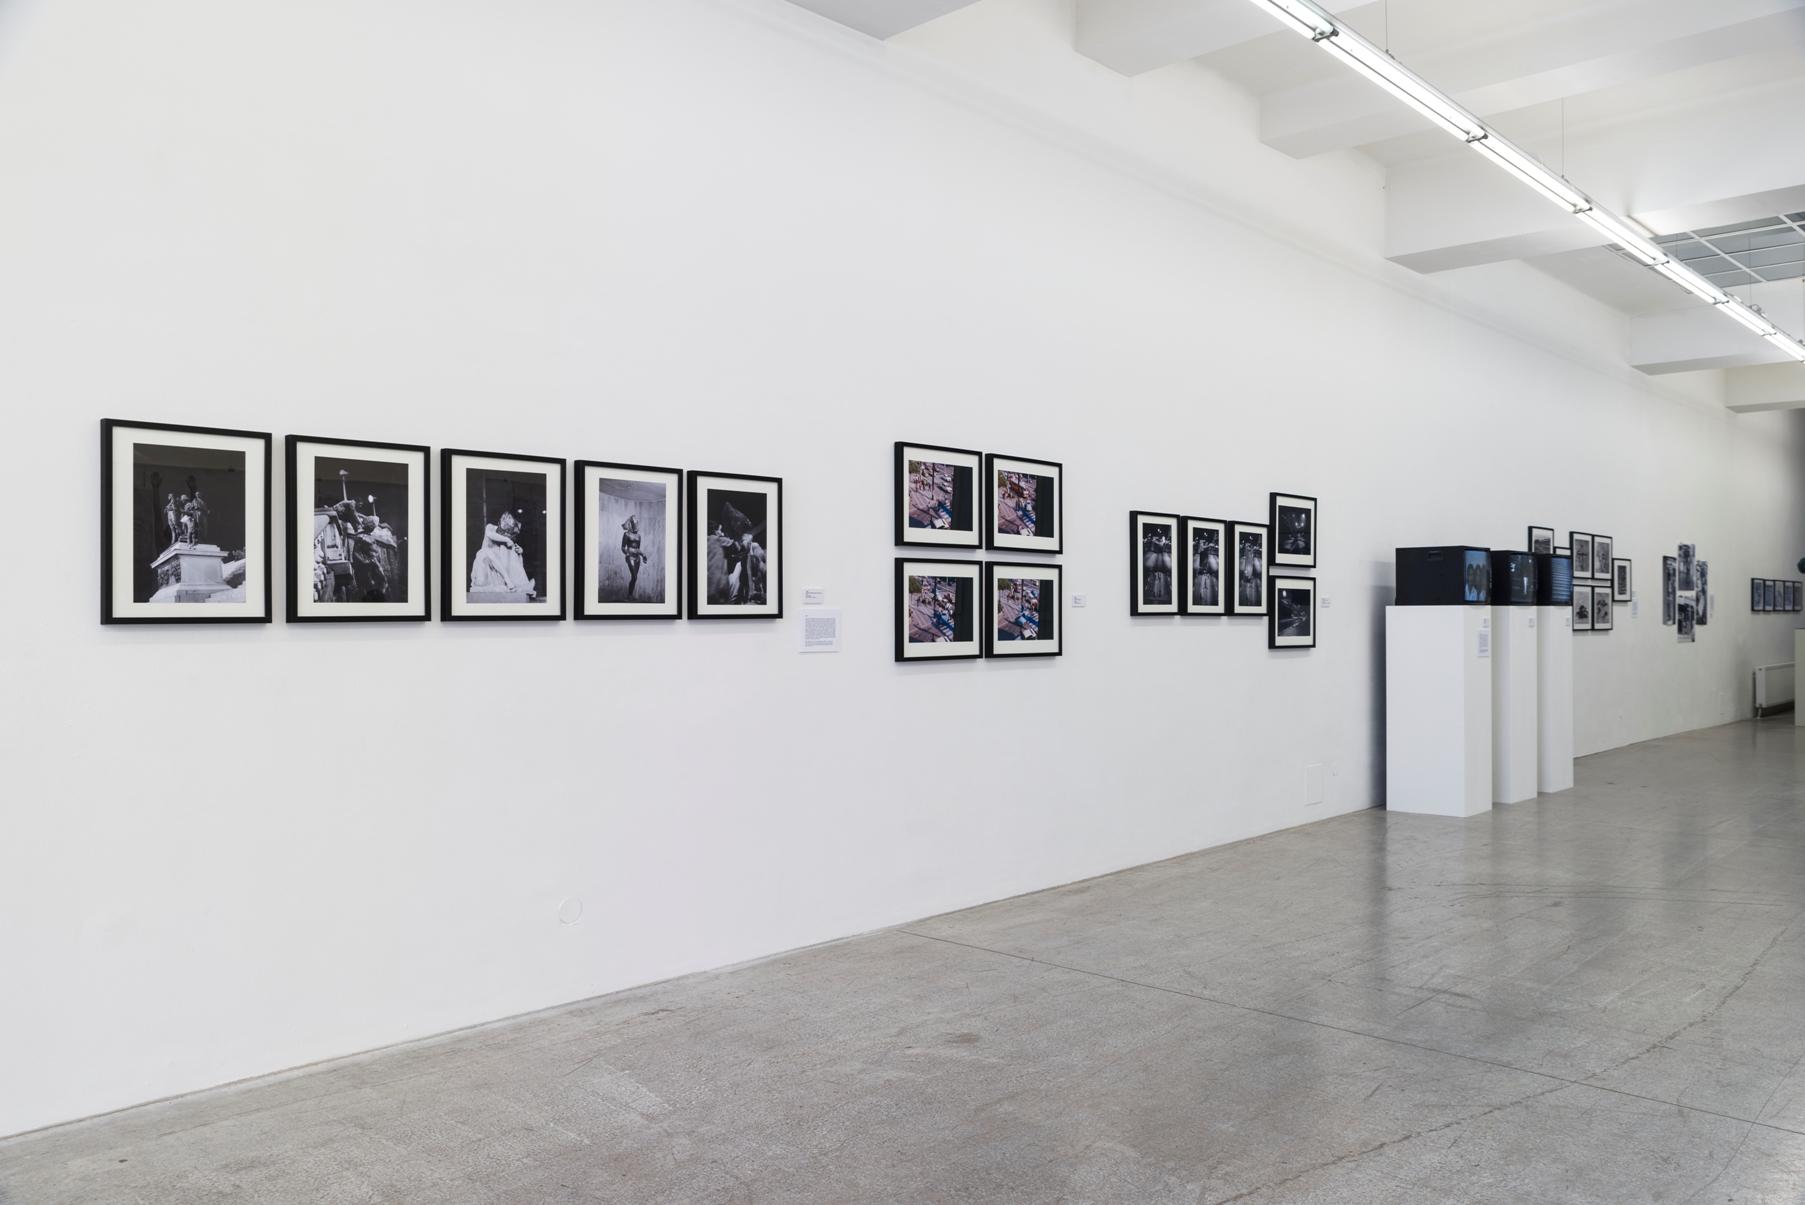 Exhibition View, Kerstin Engholm Galerie, curated by_Heike Munder, 2016, Photo: Kerstin Engholm Galerie